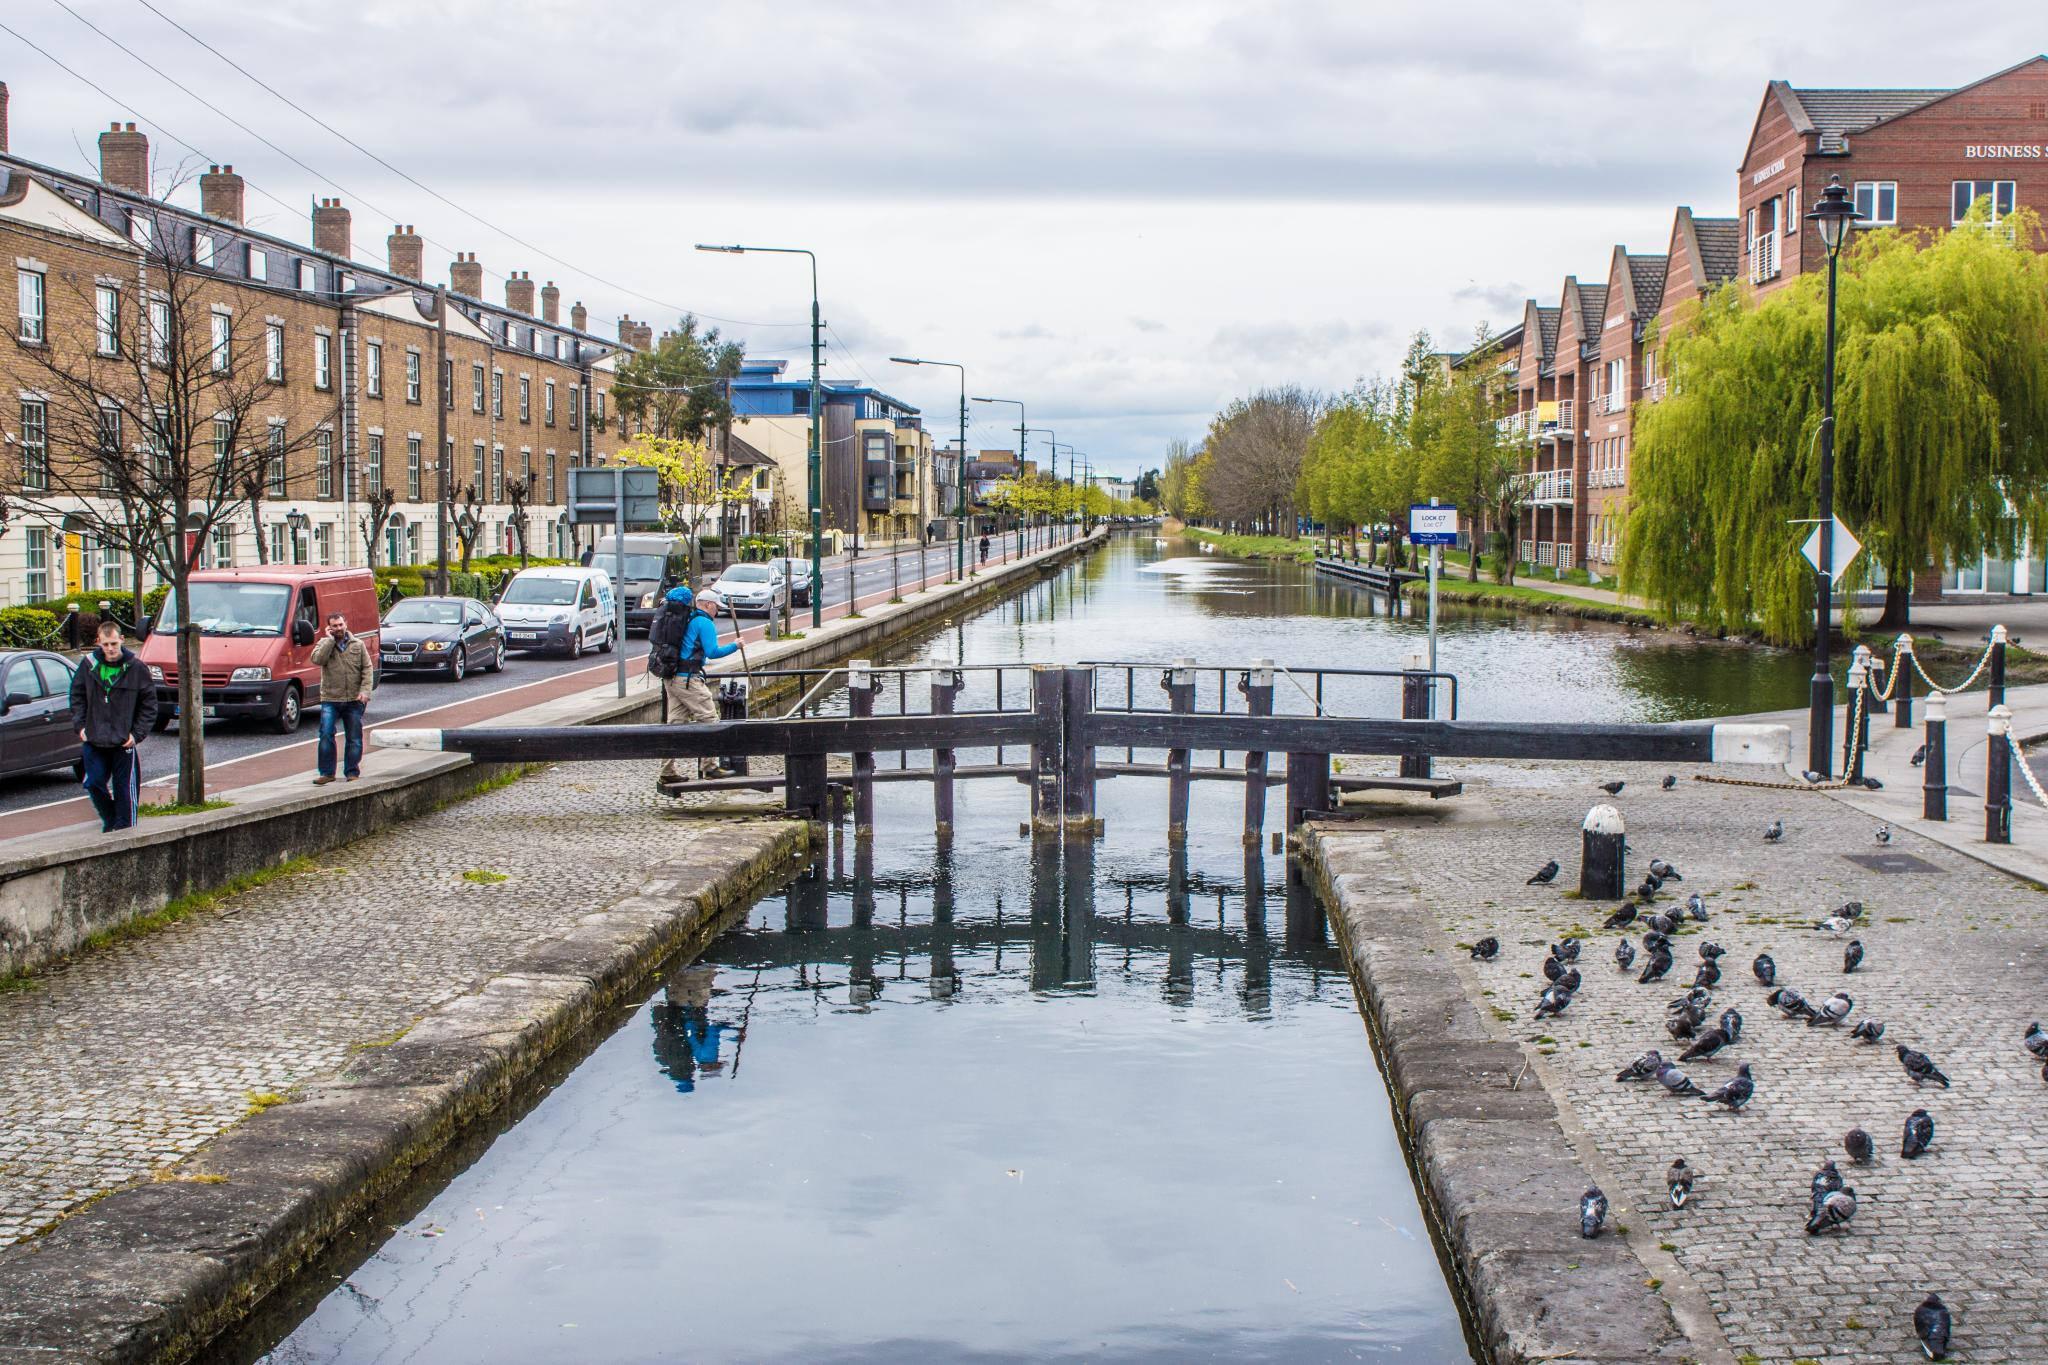 ES STREETS DUBLIN